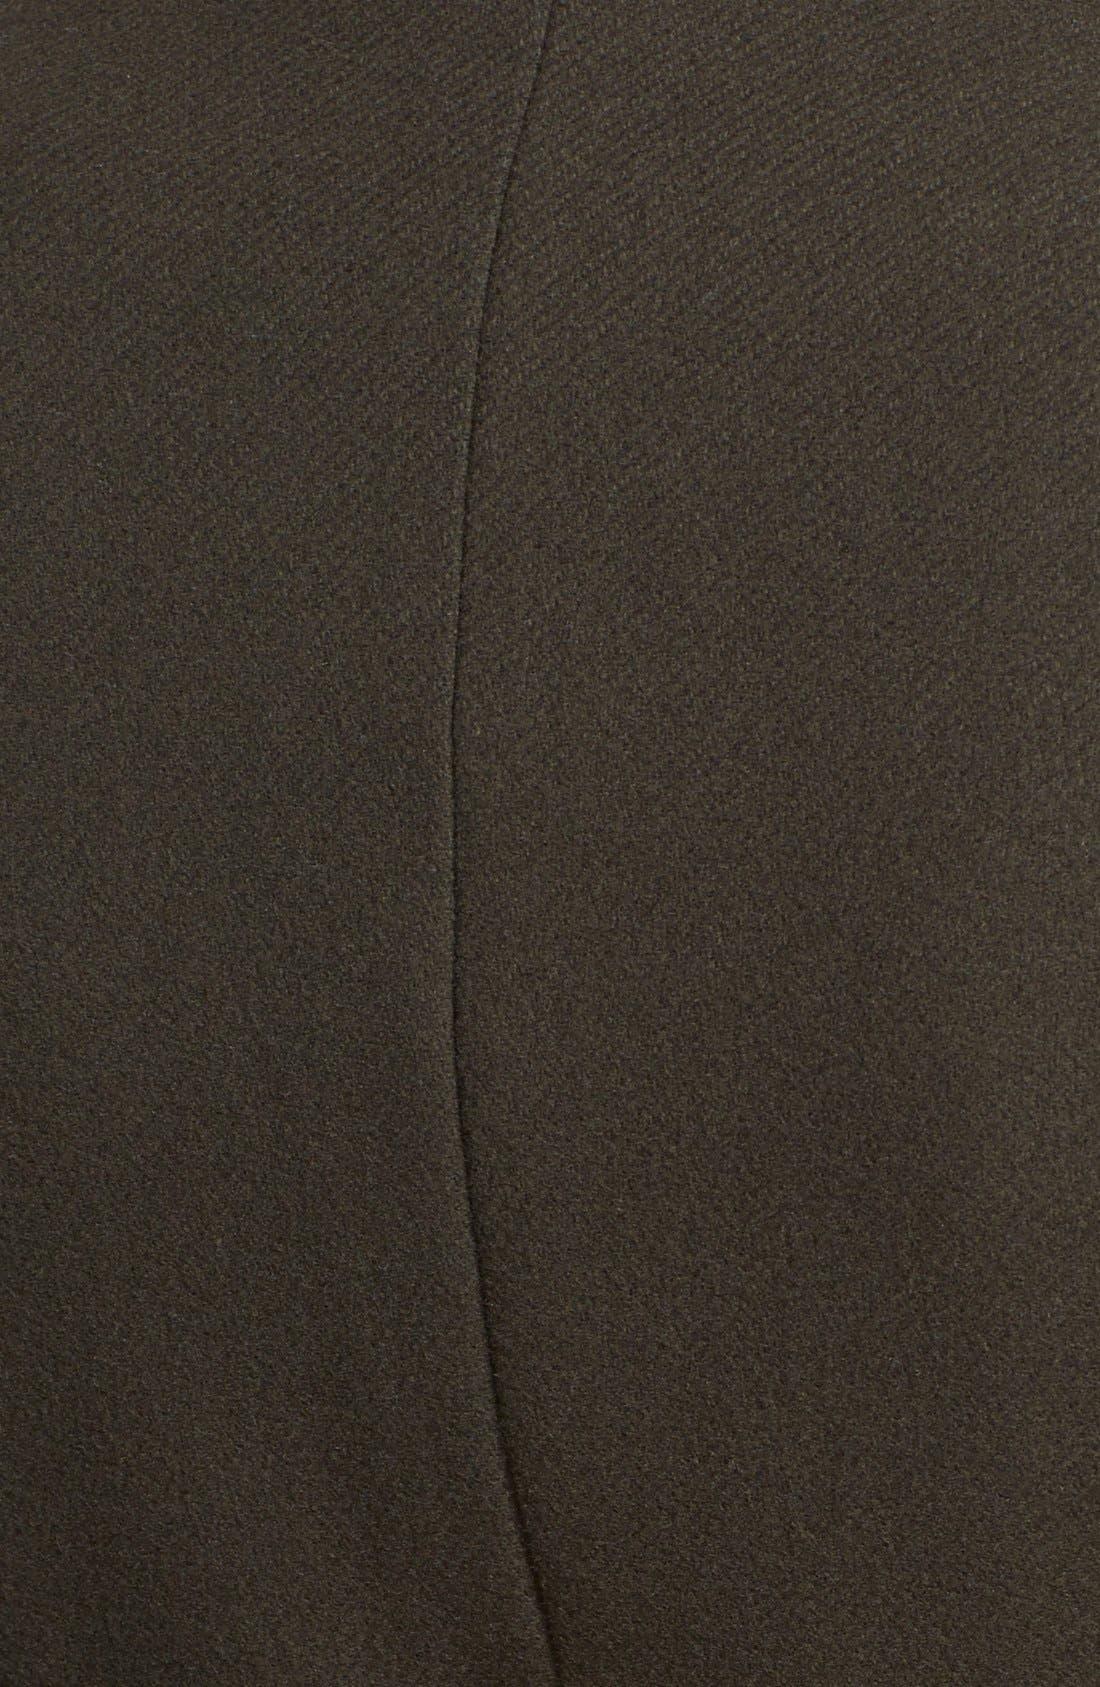 Alternate Image 3  - Elie Tahari 'India' Stand Collar Belted Wool Blend Coat